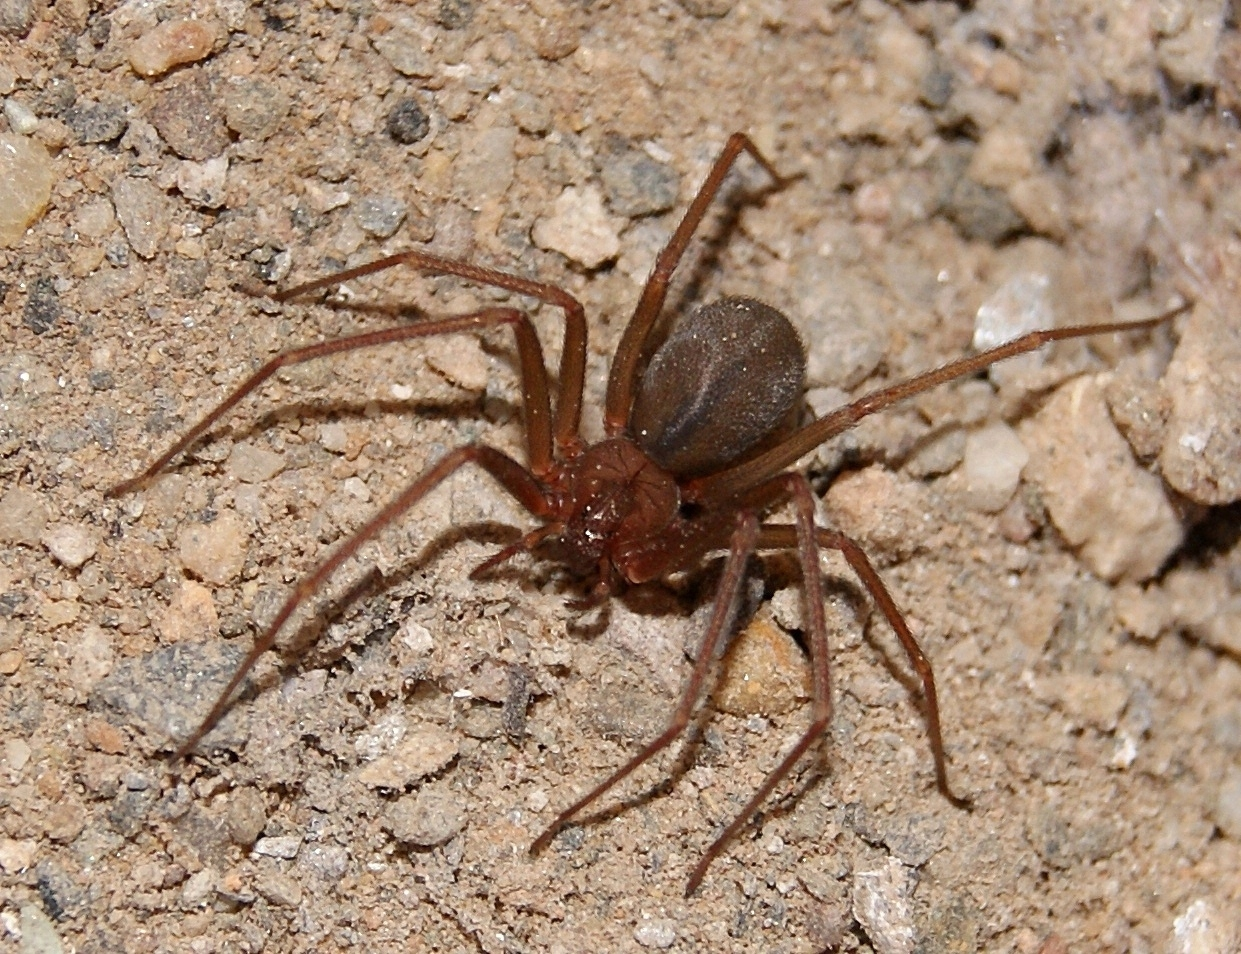 Image of Mediterranean recluse spider